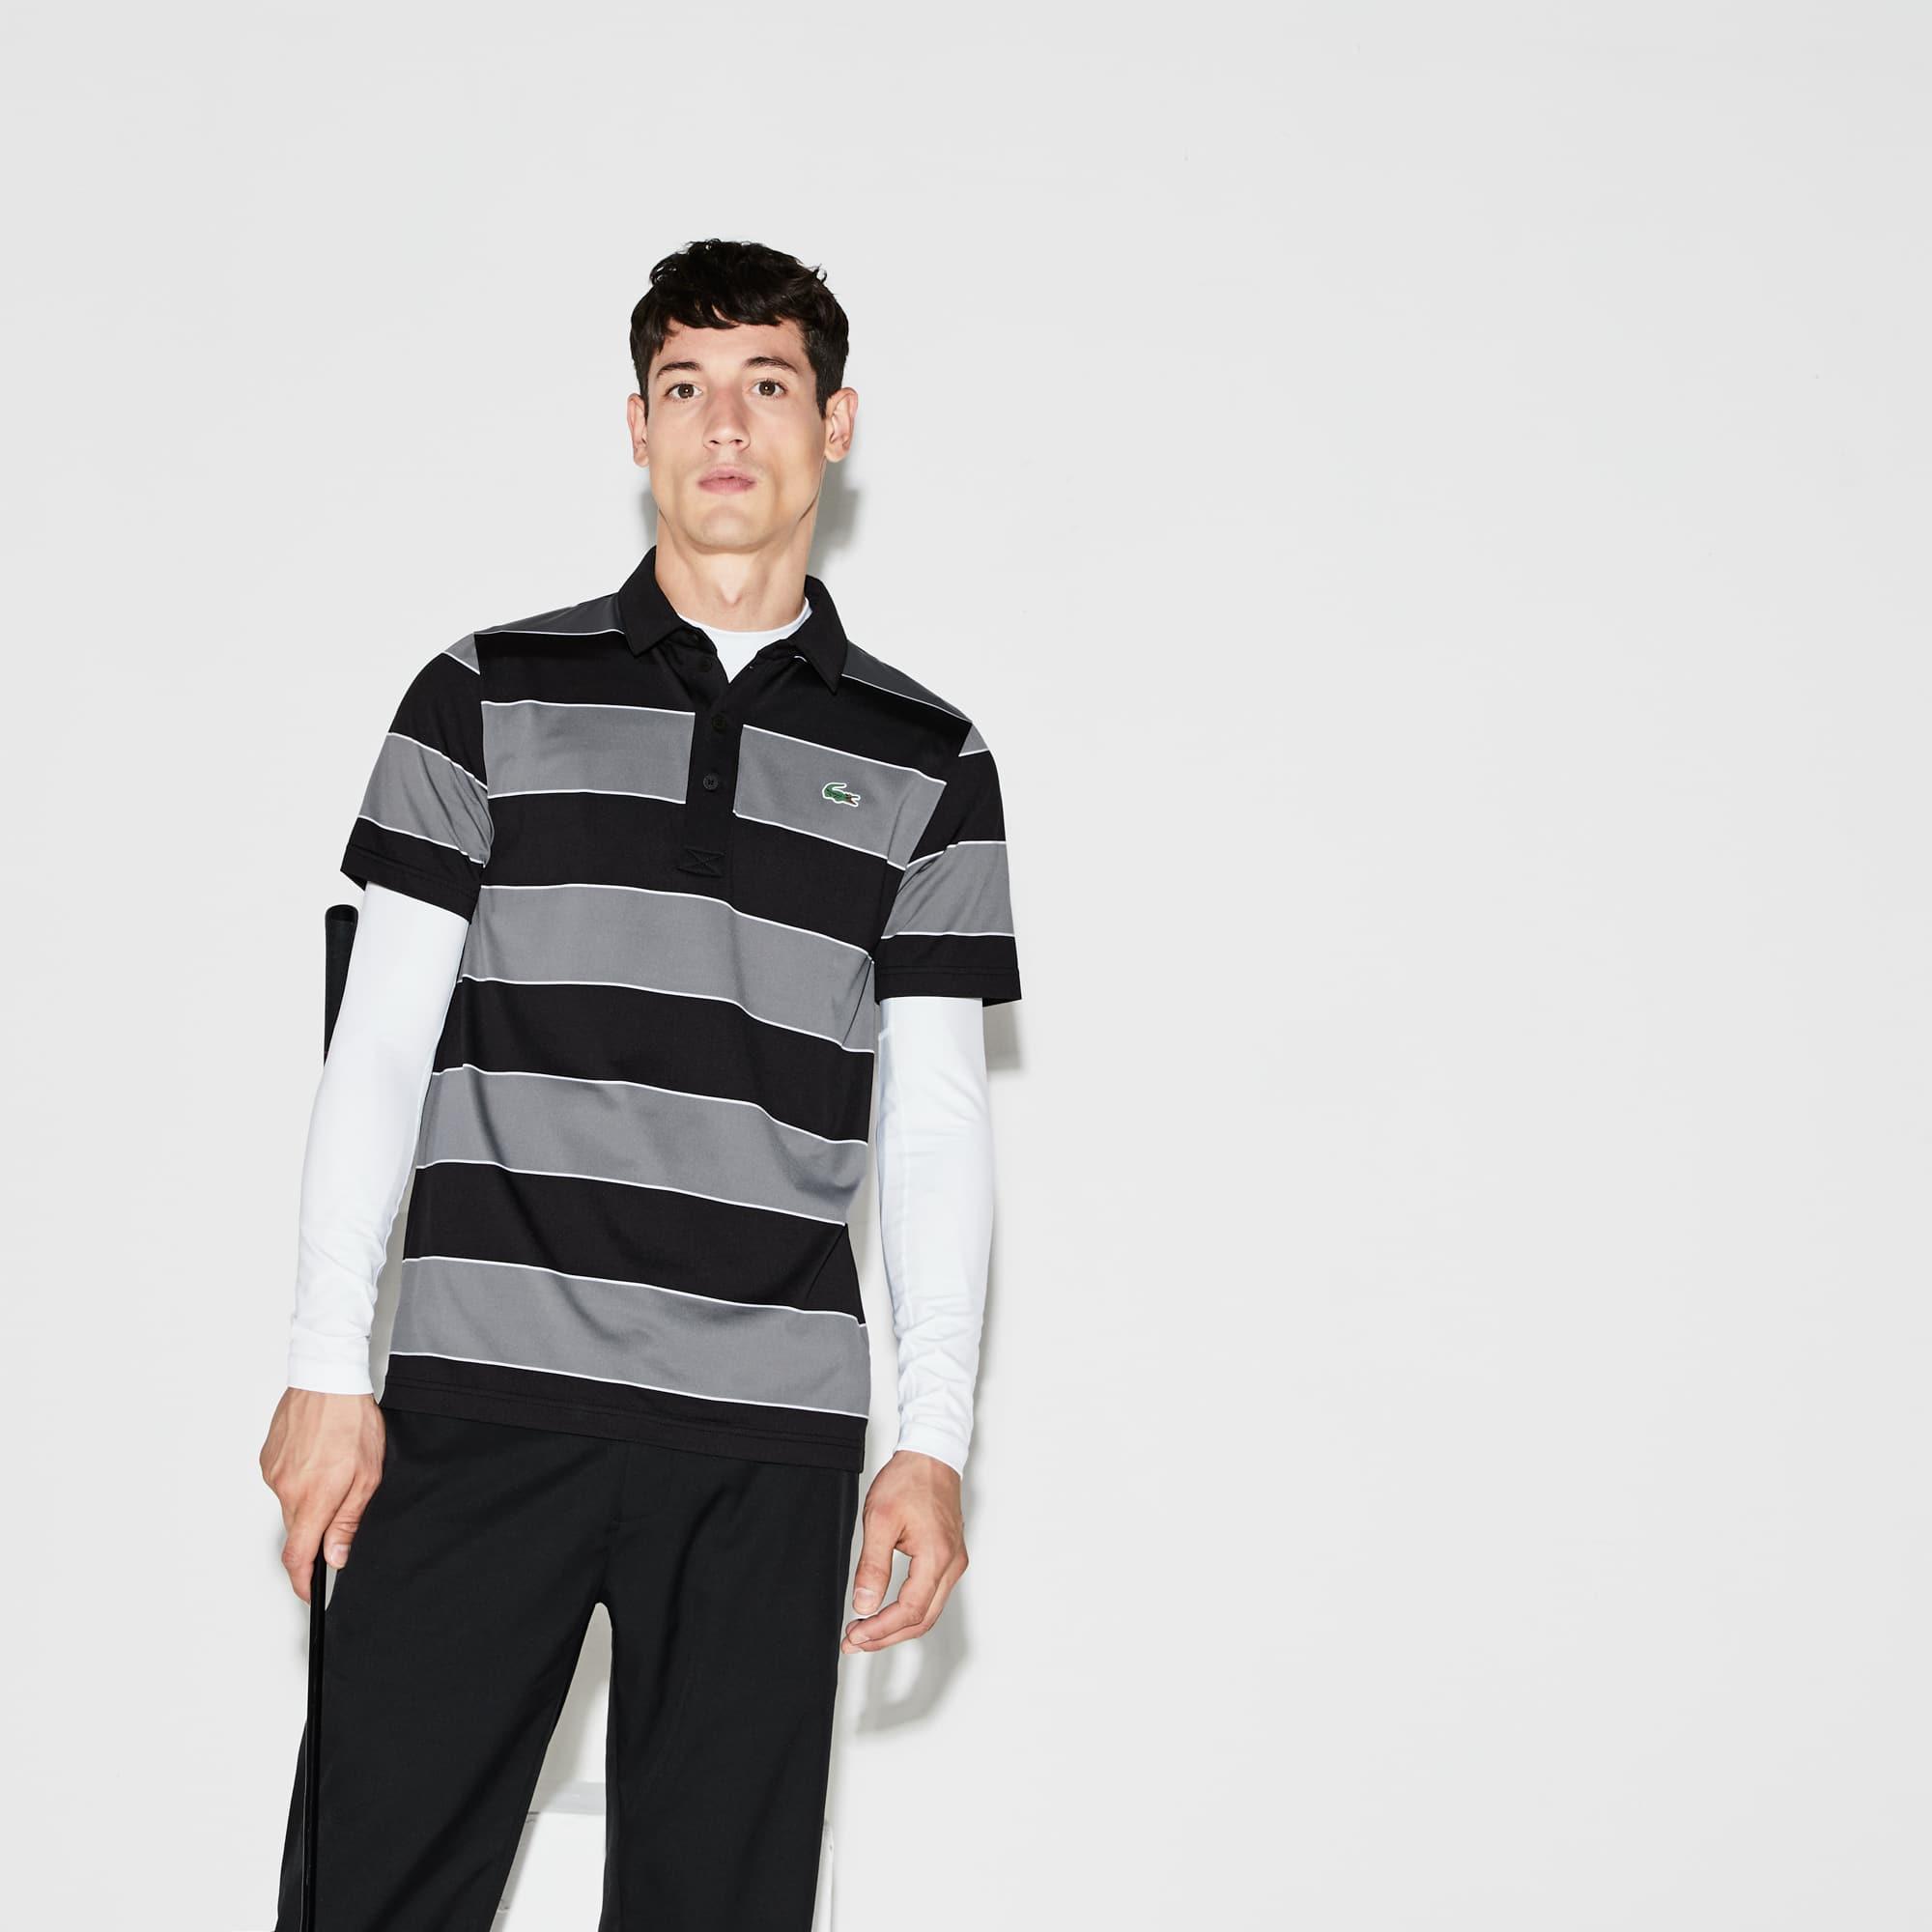 Herren LACOSTE SPORT gestreiftes Golf-Poloshirt aus Jersey